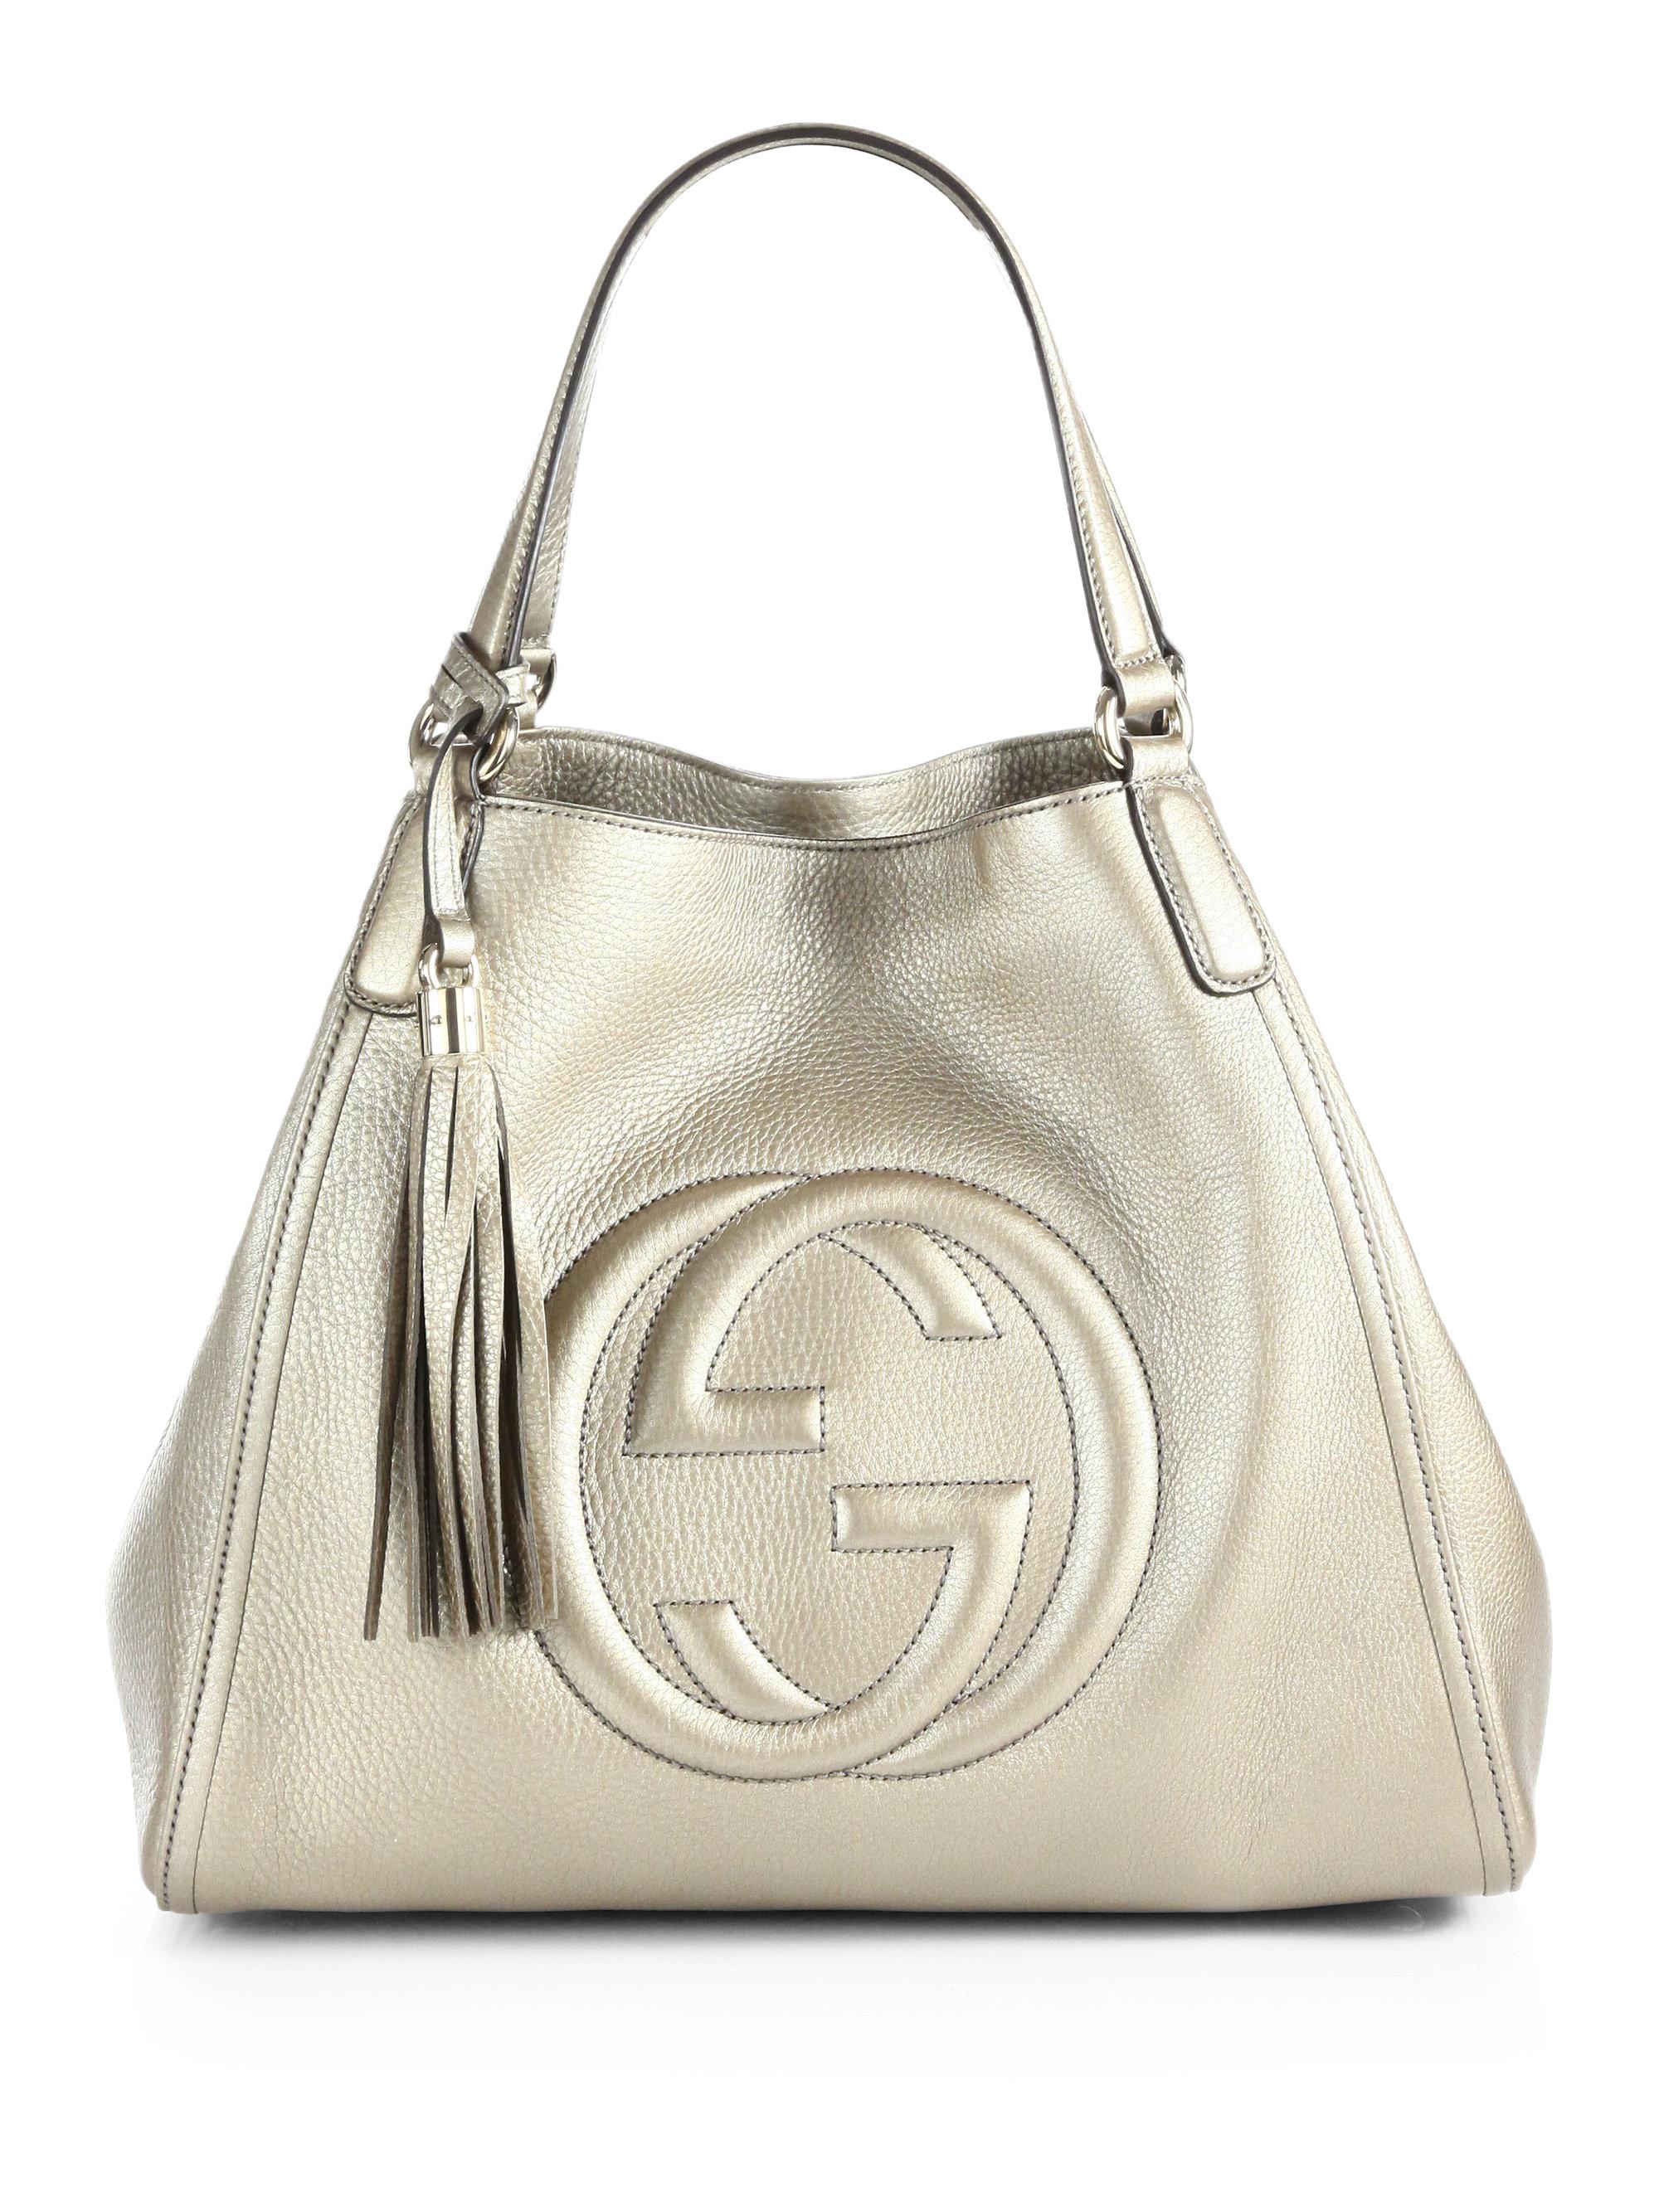 Soho Metallic Leather Shoulder Bag